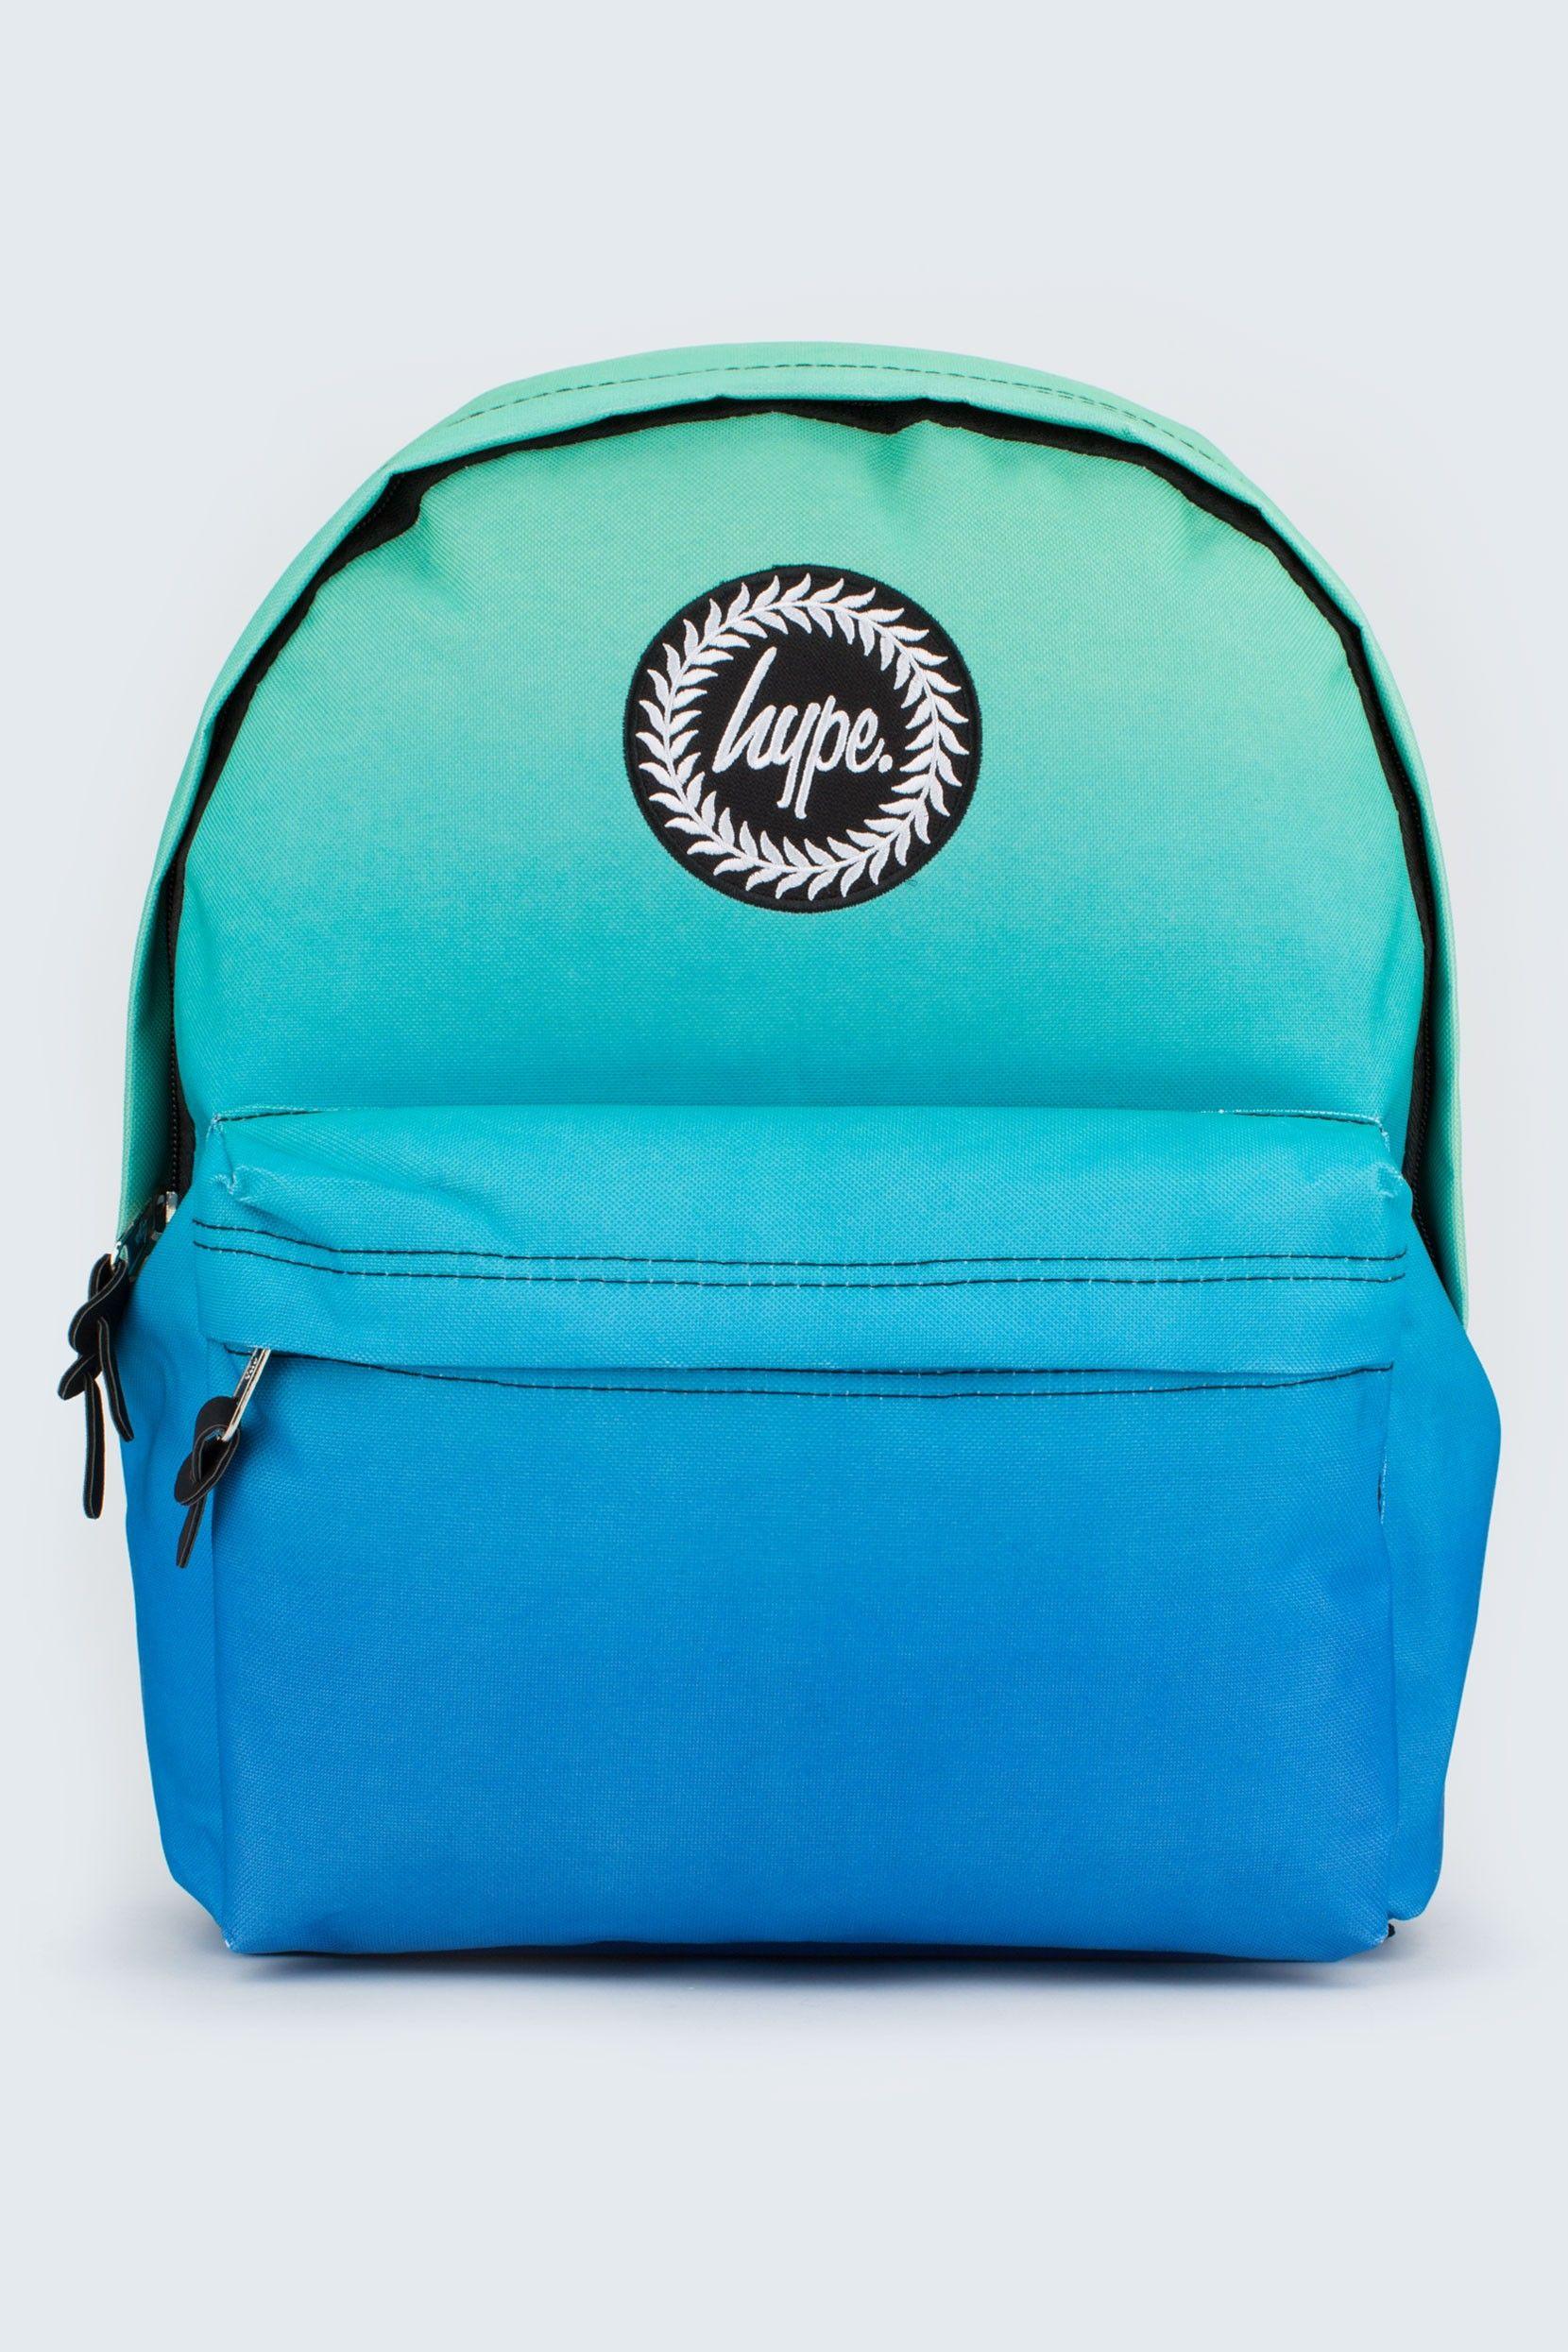 7e3e1ef410cf Hype Primary Splat Speckle Backpack Rucksack Bag Black- Fenix ...